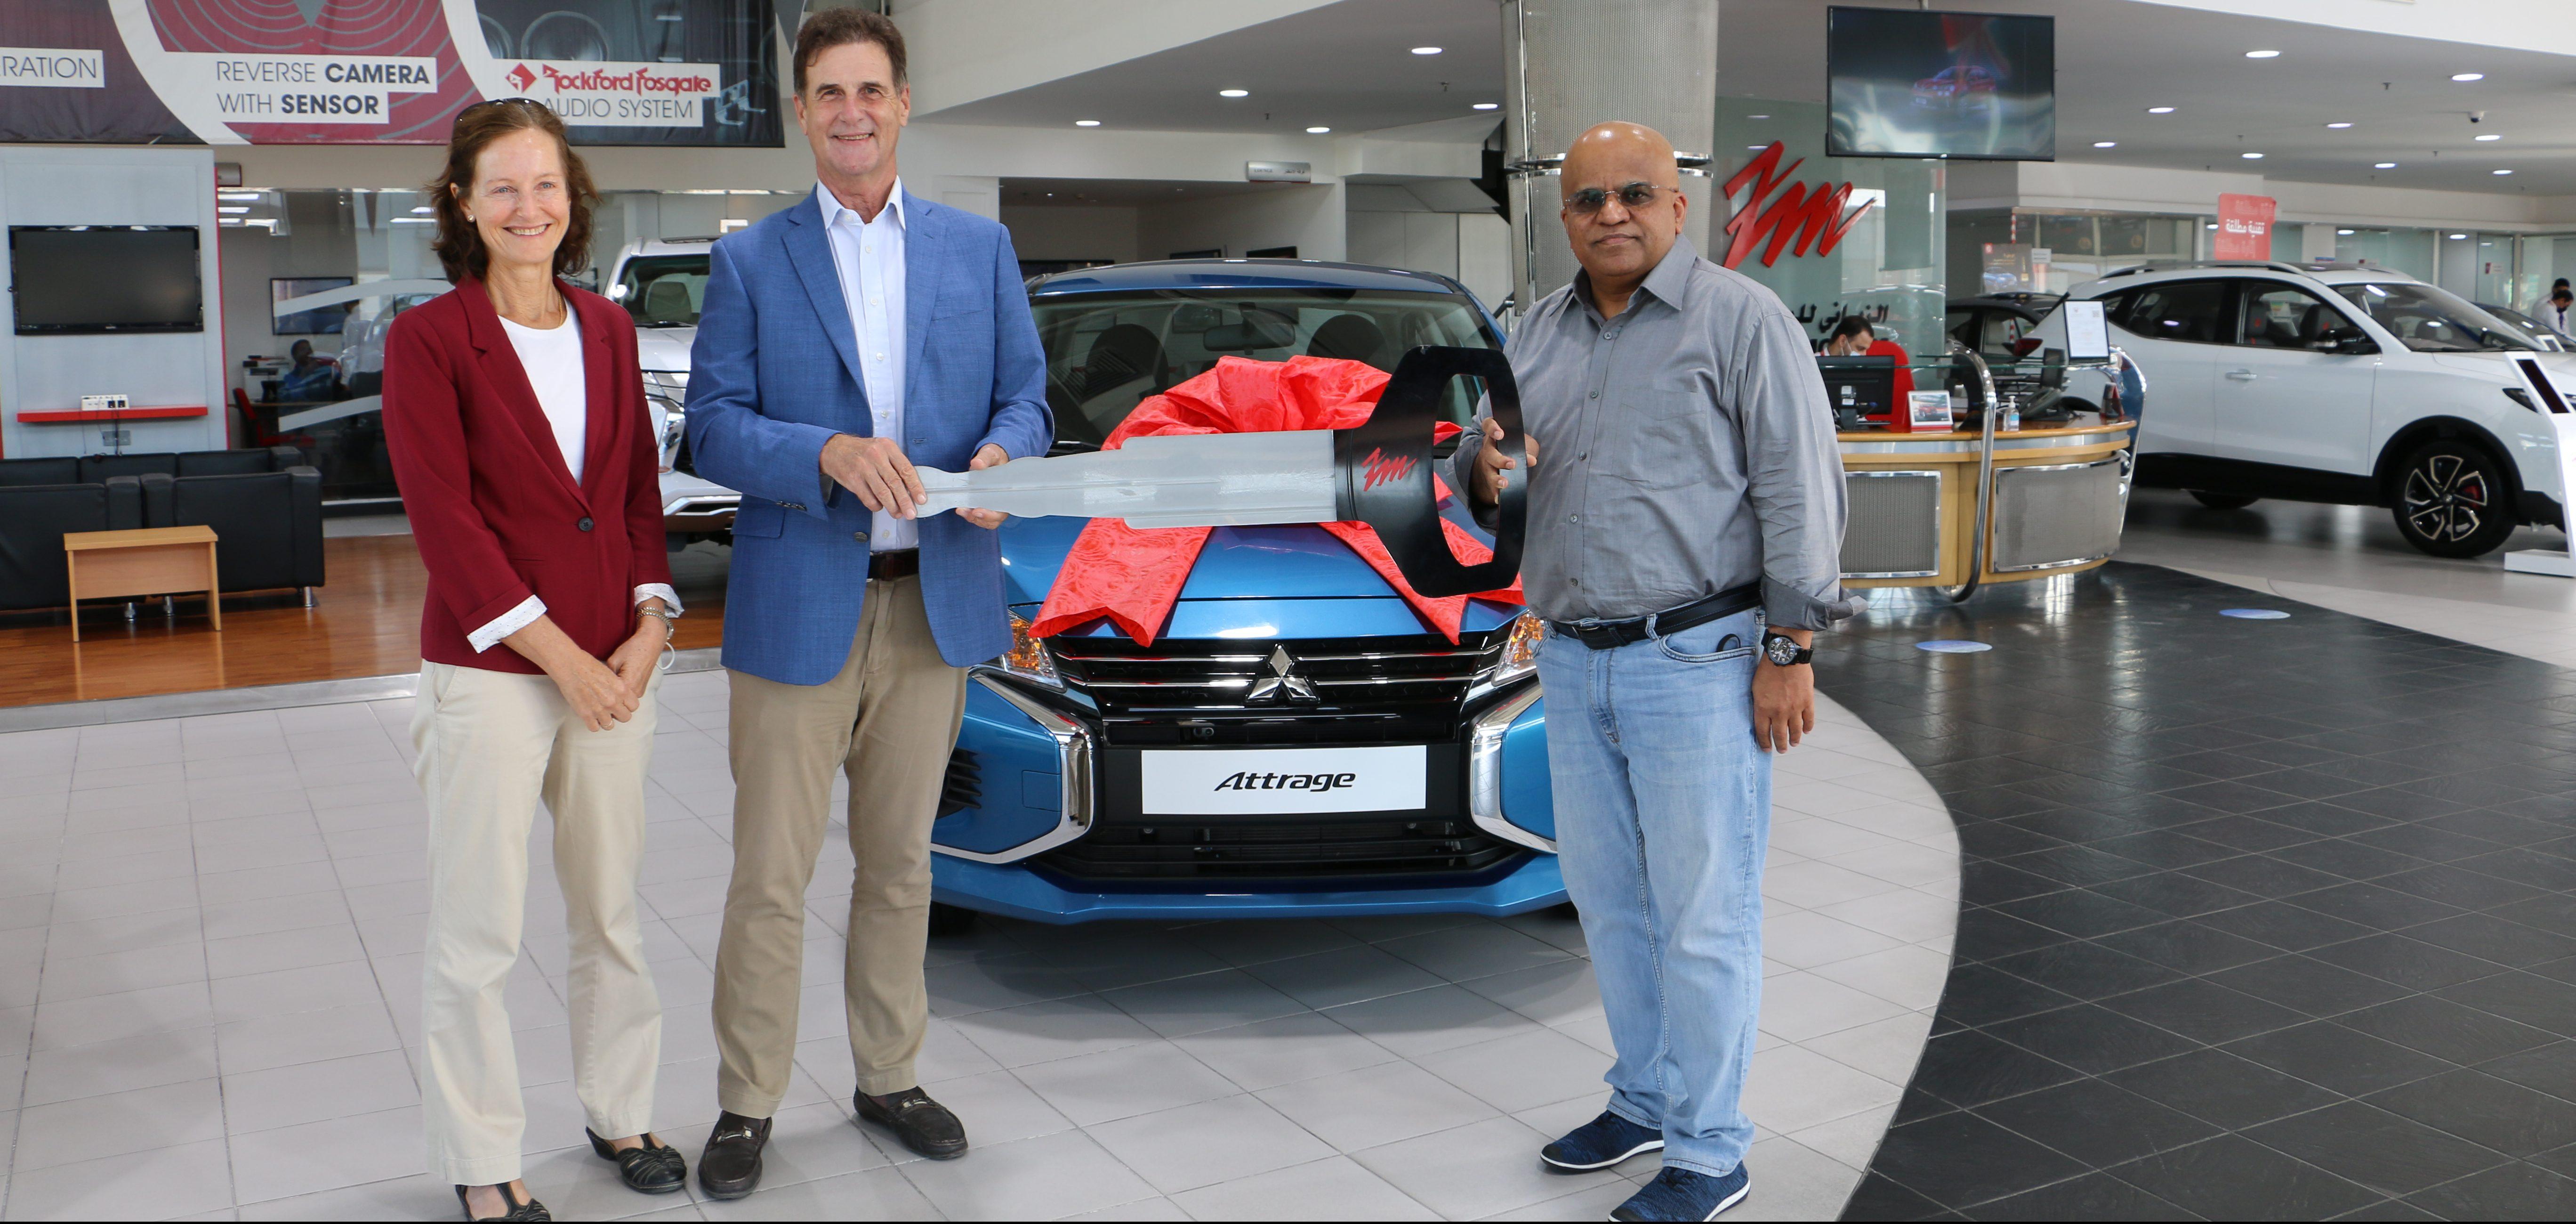 'Mitsubishi Motors' Announce Lucky Winner of its Ramadan Promotion